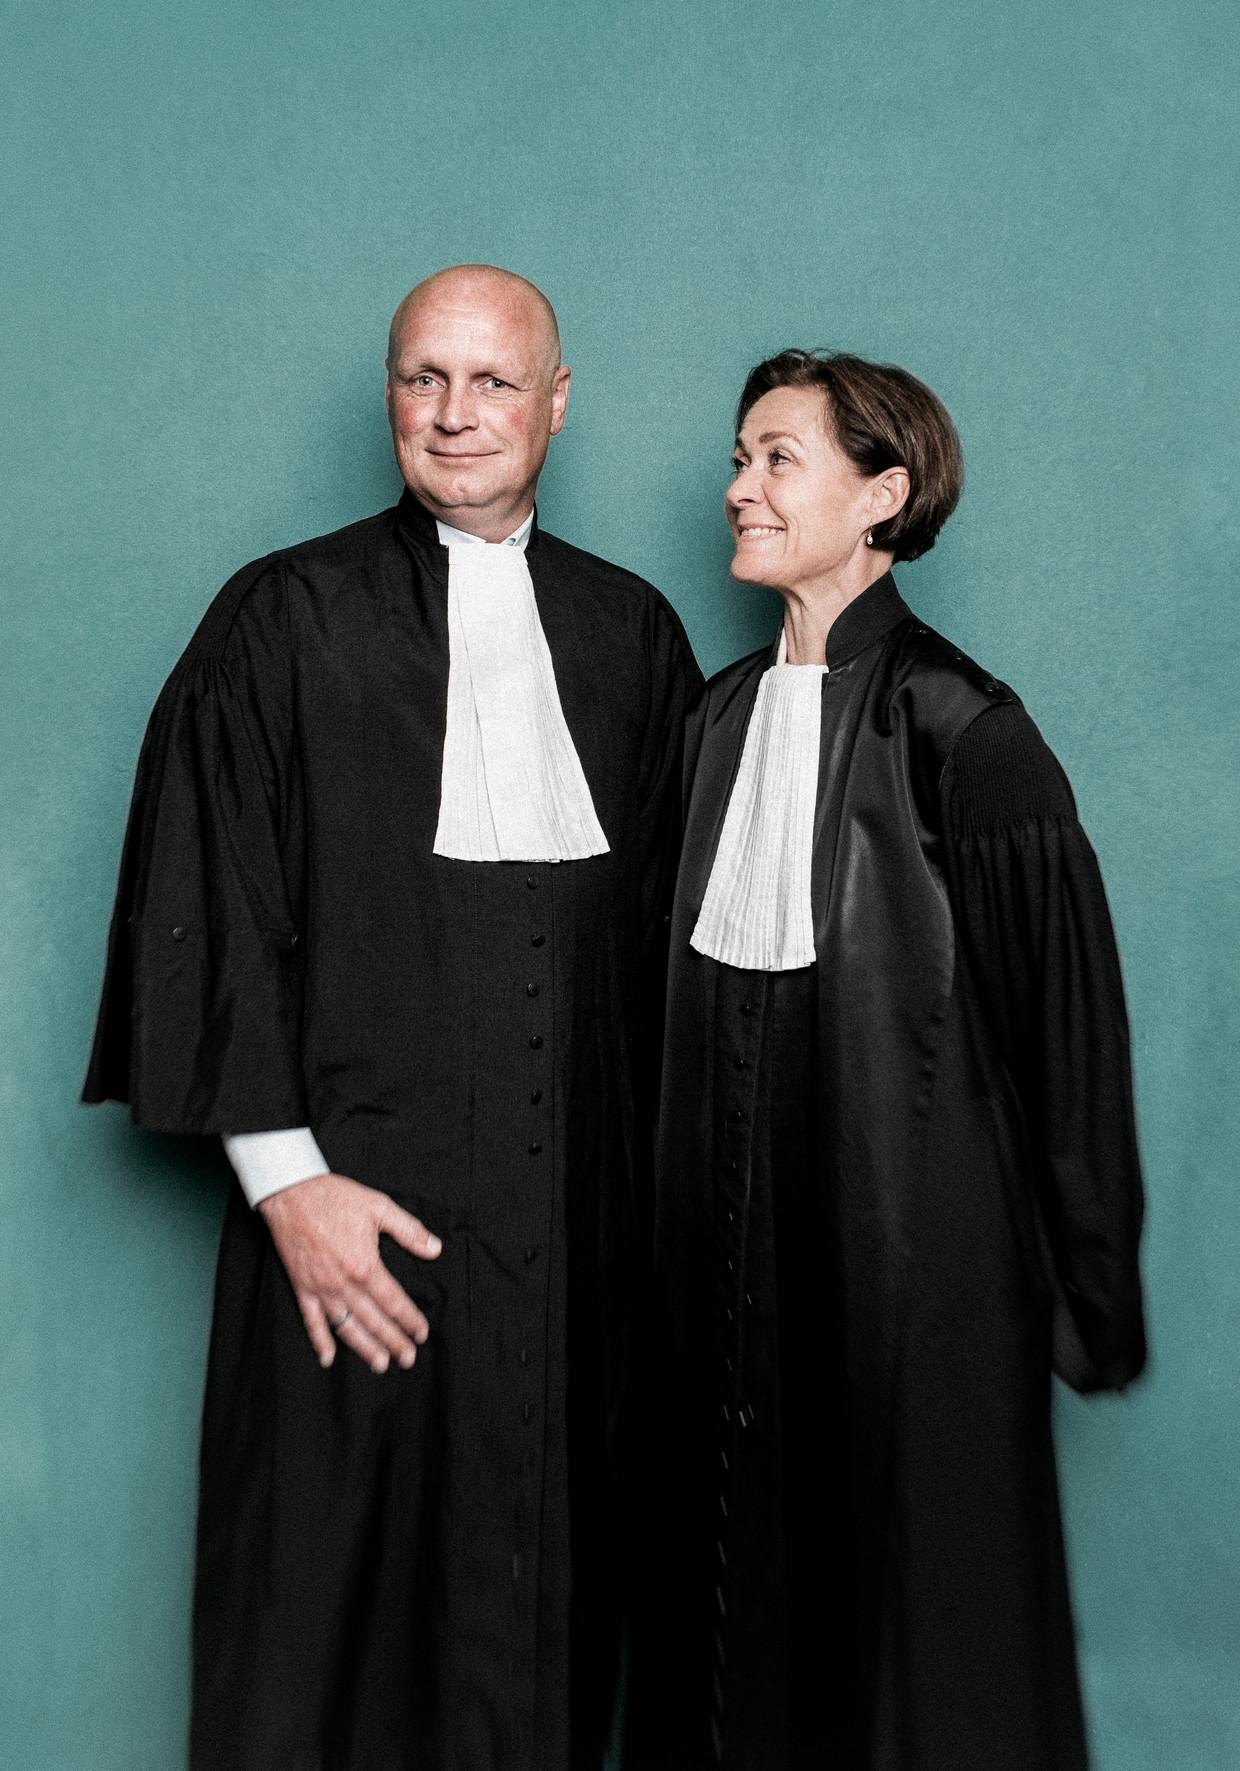 Officieren Lars Stempher en Sabine Tammes.